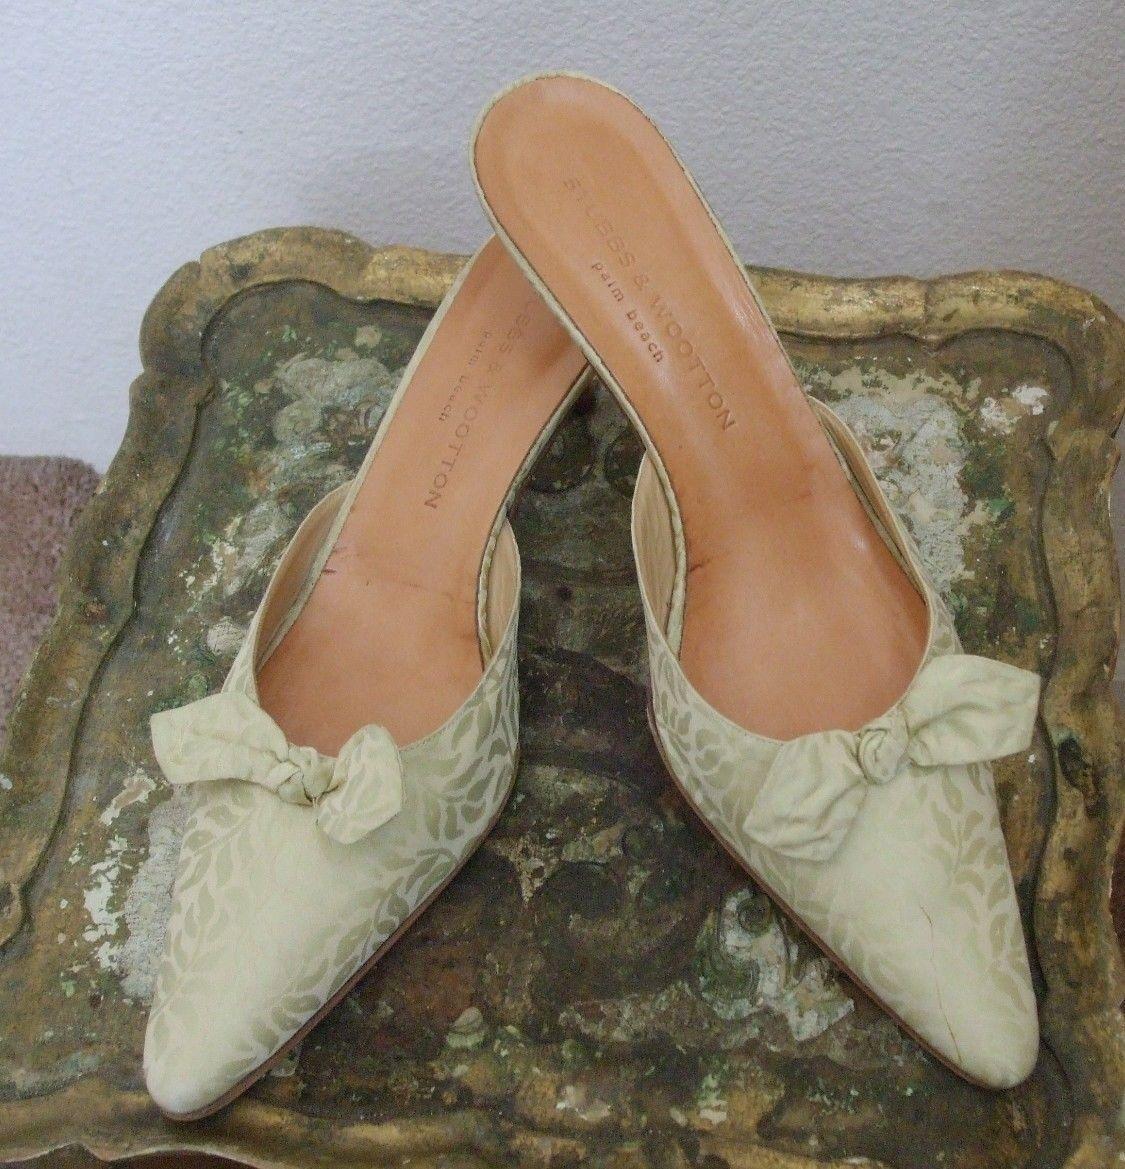 Stubbs & Wootton Palm Beach Talla 9.5 9.5 9.5 brocado de seda pastel verde mula para mujeres Zapatos  en stock